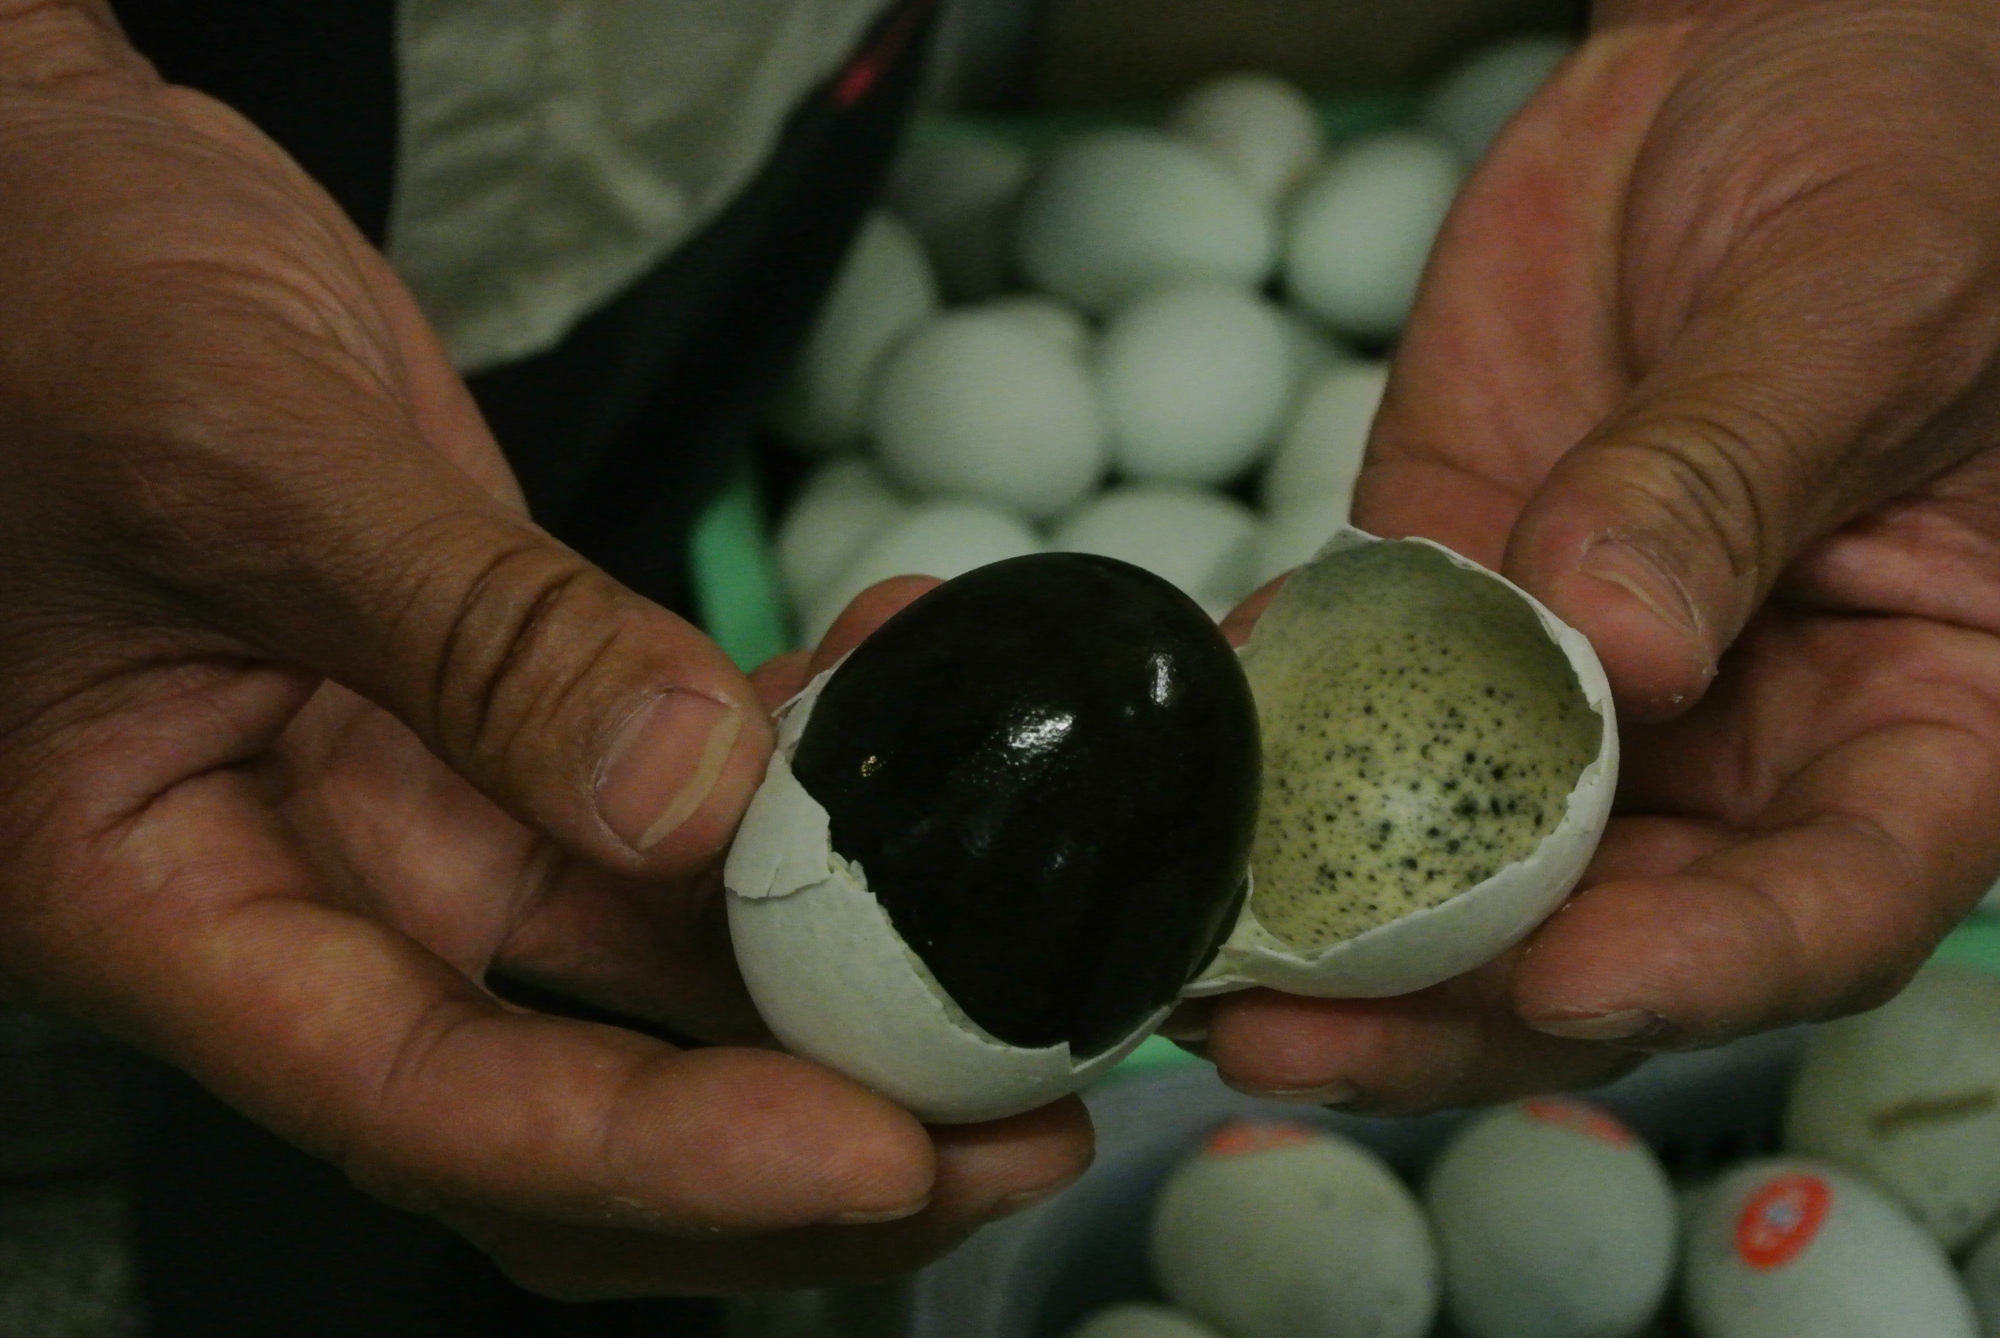 Revealing the black inside of a 100 year egg, Beijing